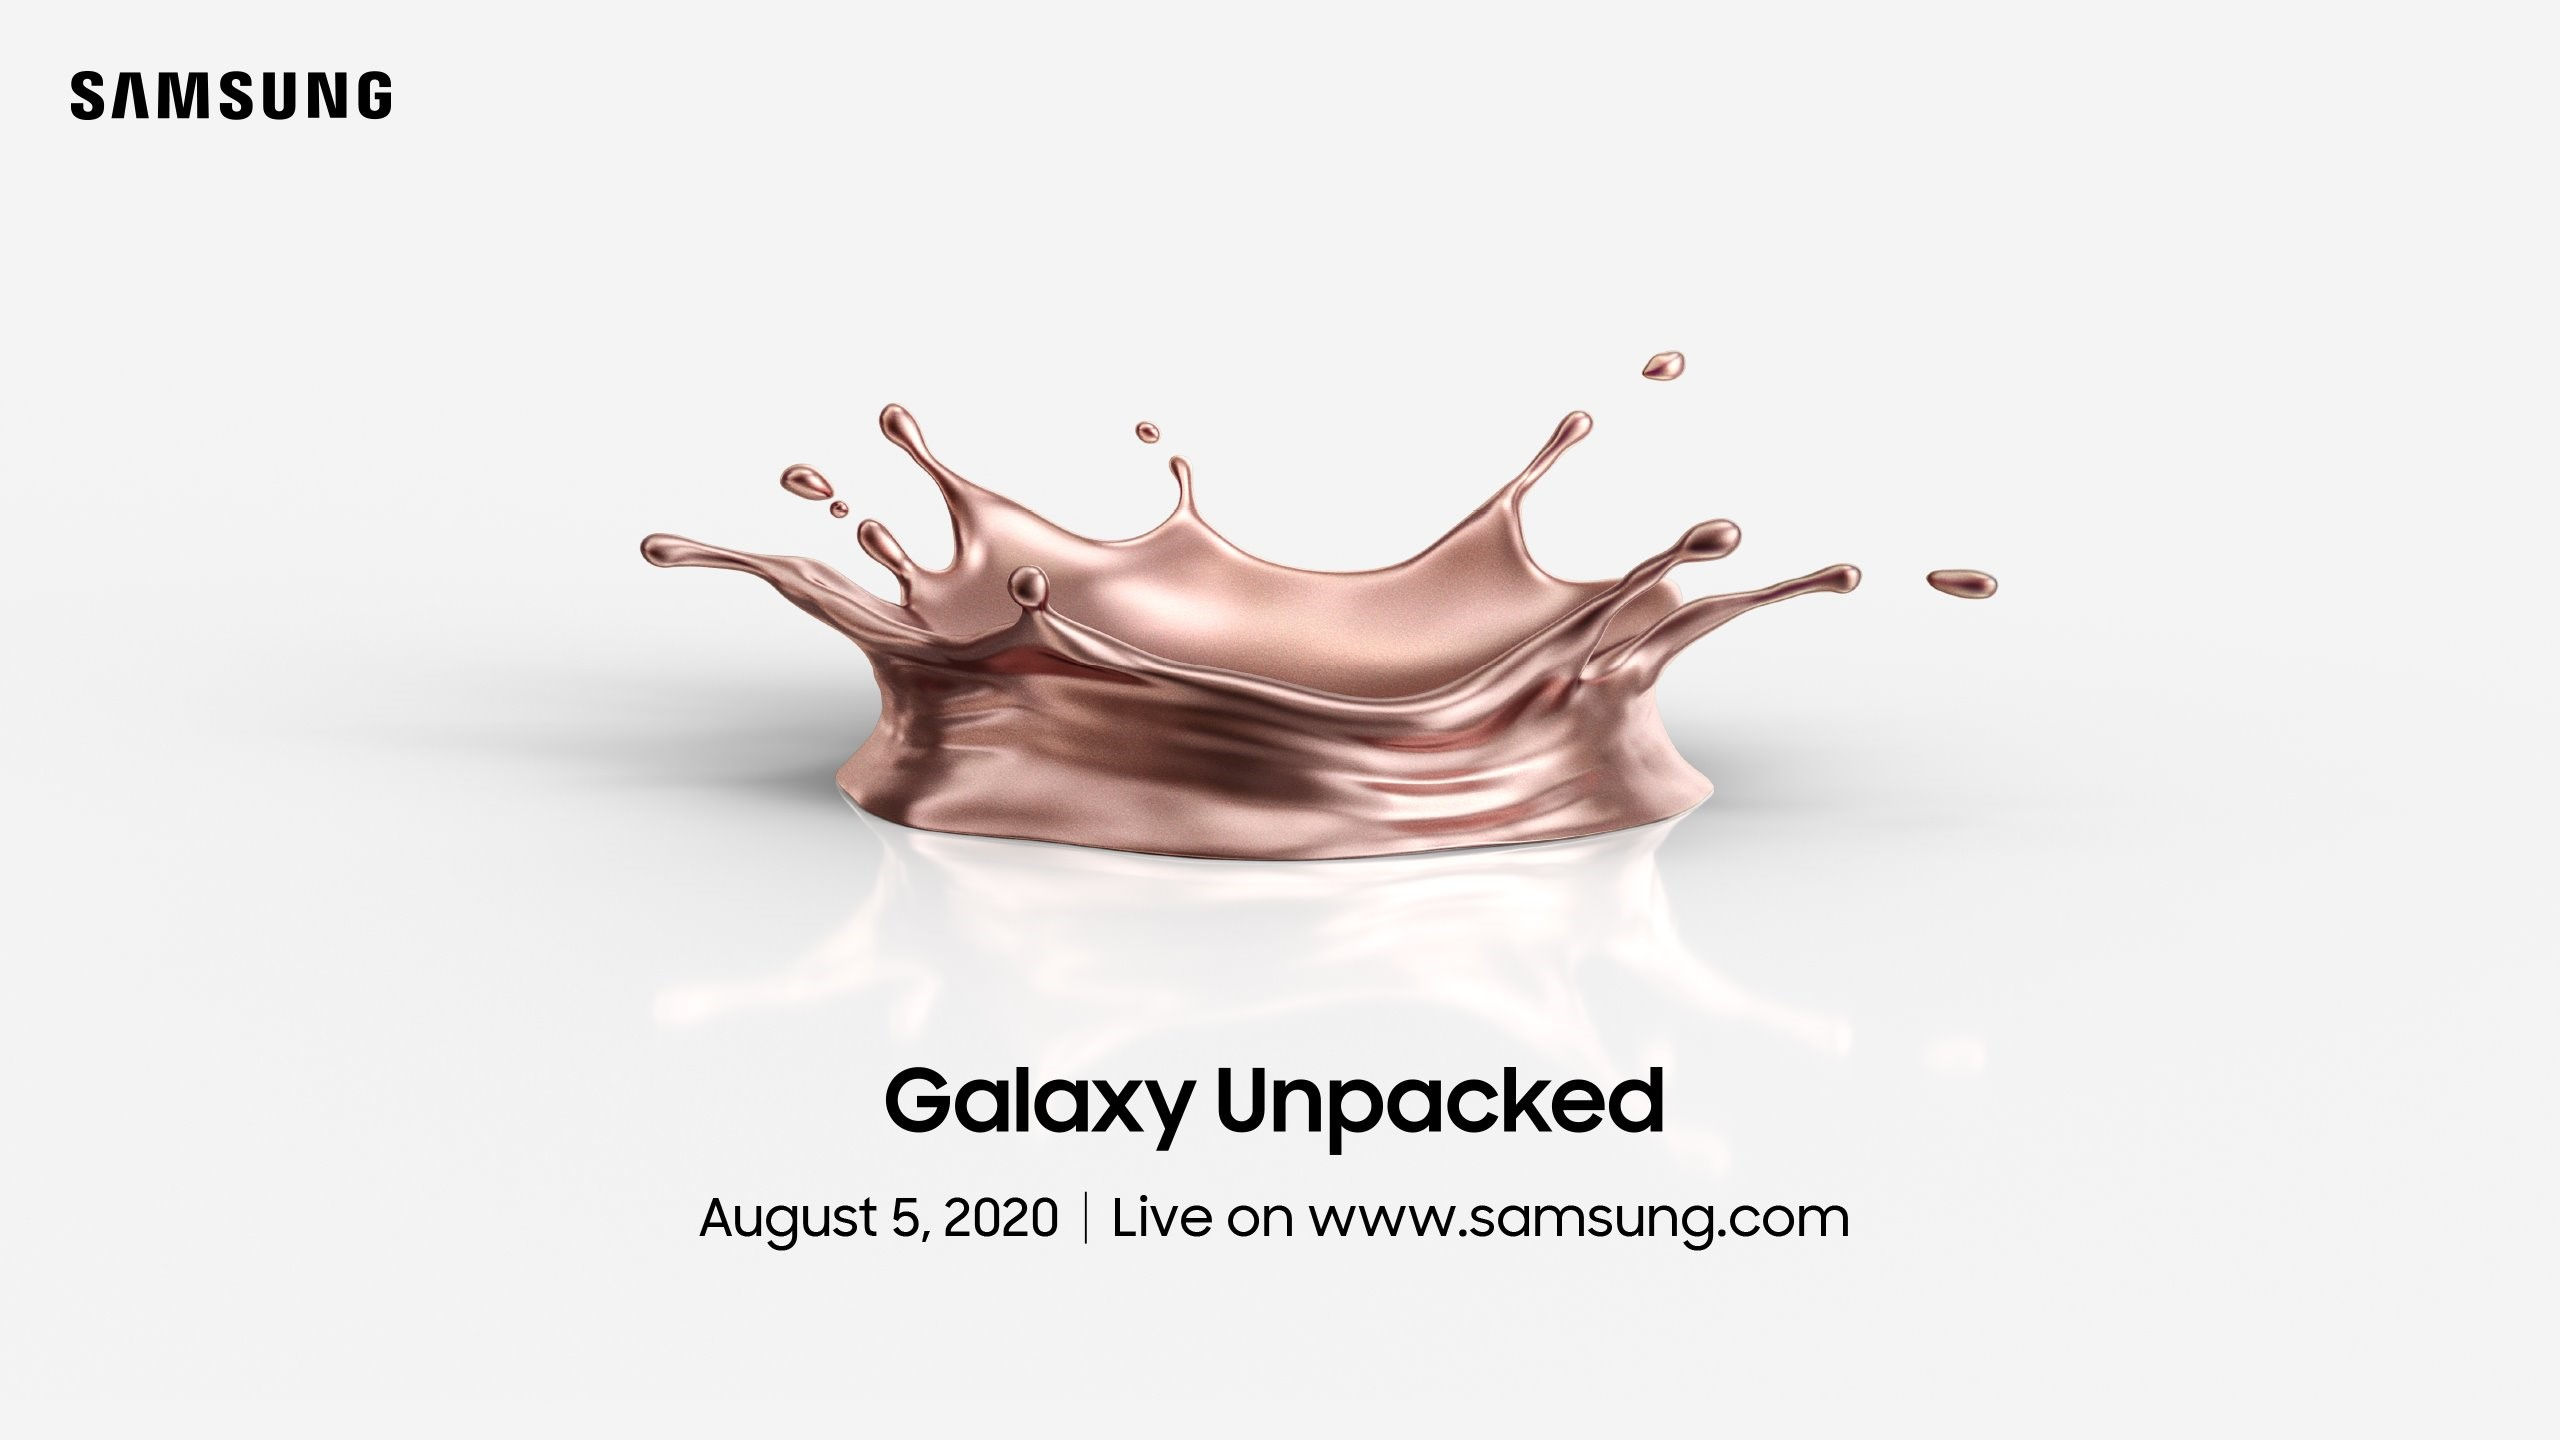 samsung 08052020 galaxy unpacked